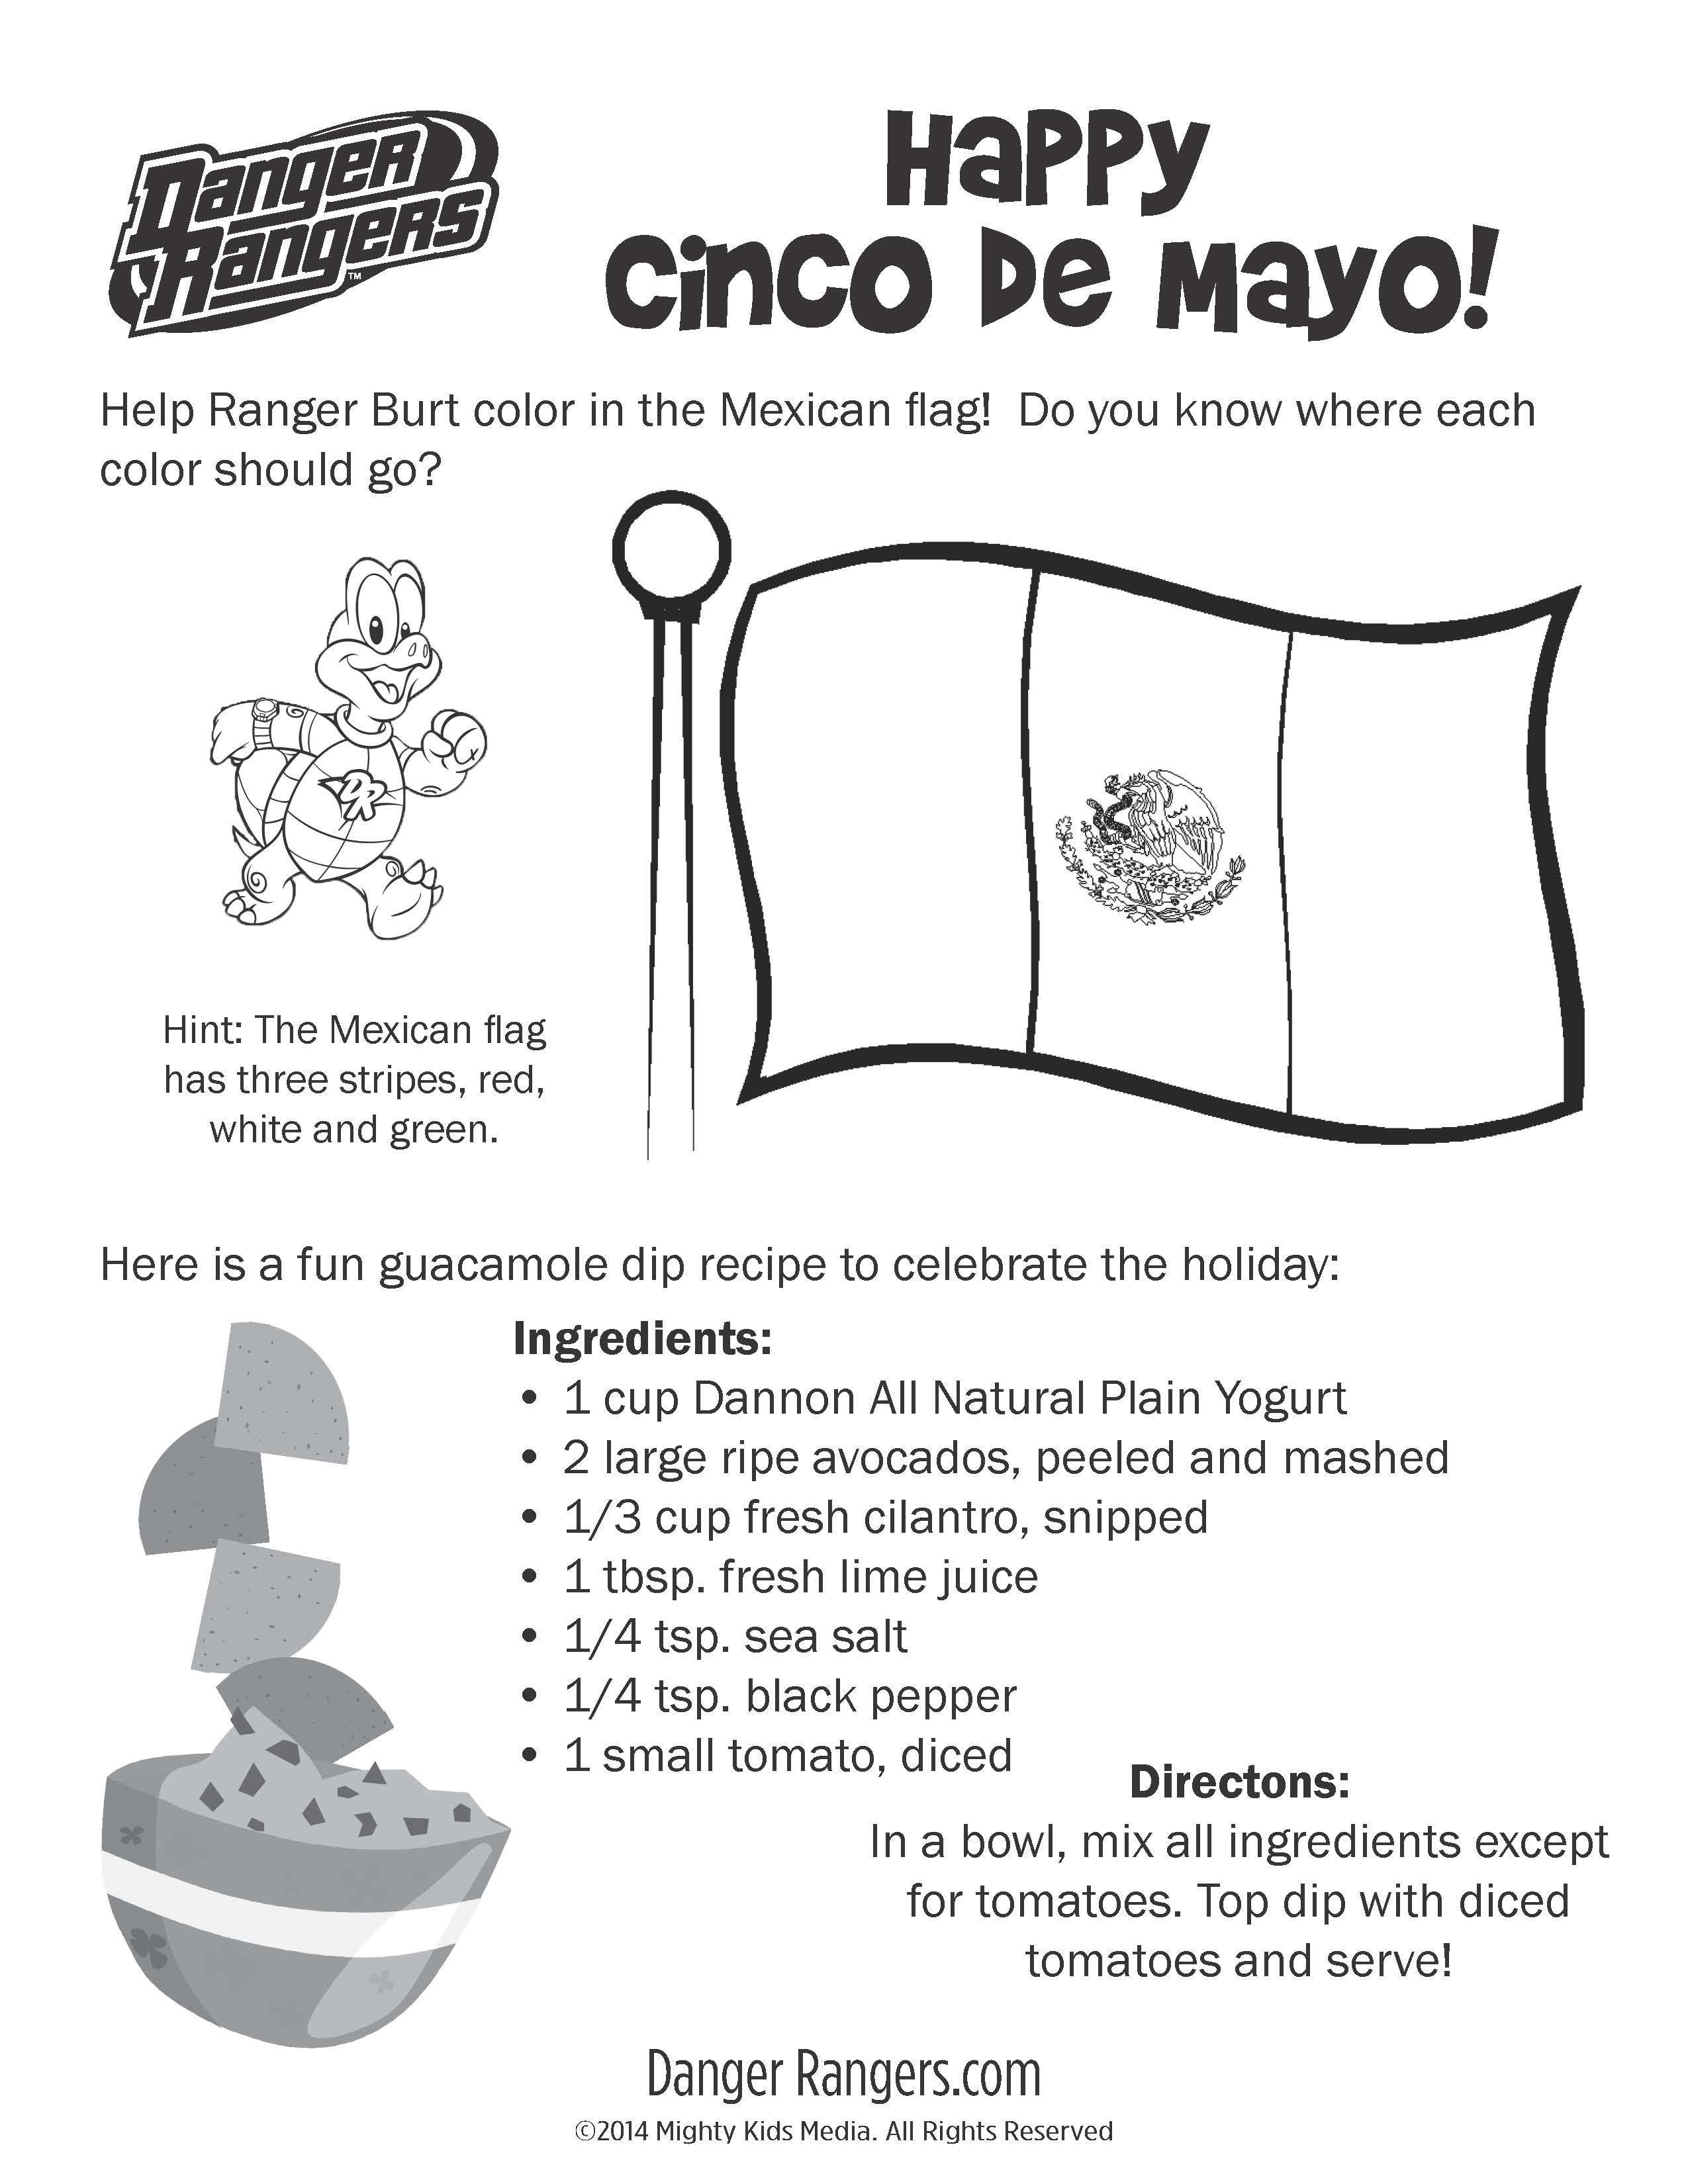 Pin By Mighty Kids Media On Coloring And Activity Sheets Cinco De Mayo Fun Guacamole De Mayo [ 3300 x 2550 Pixel ]